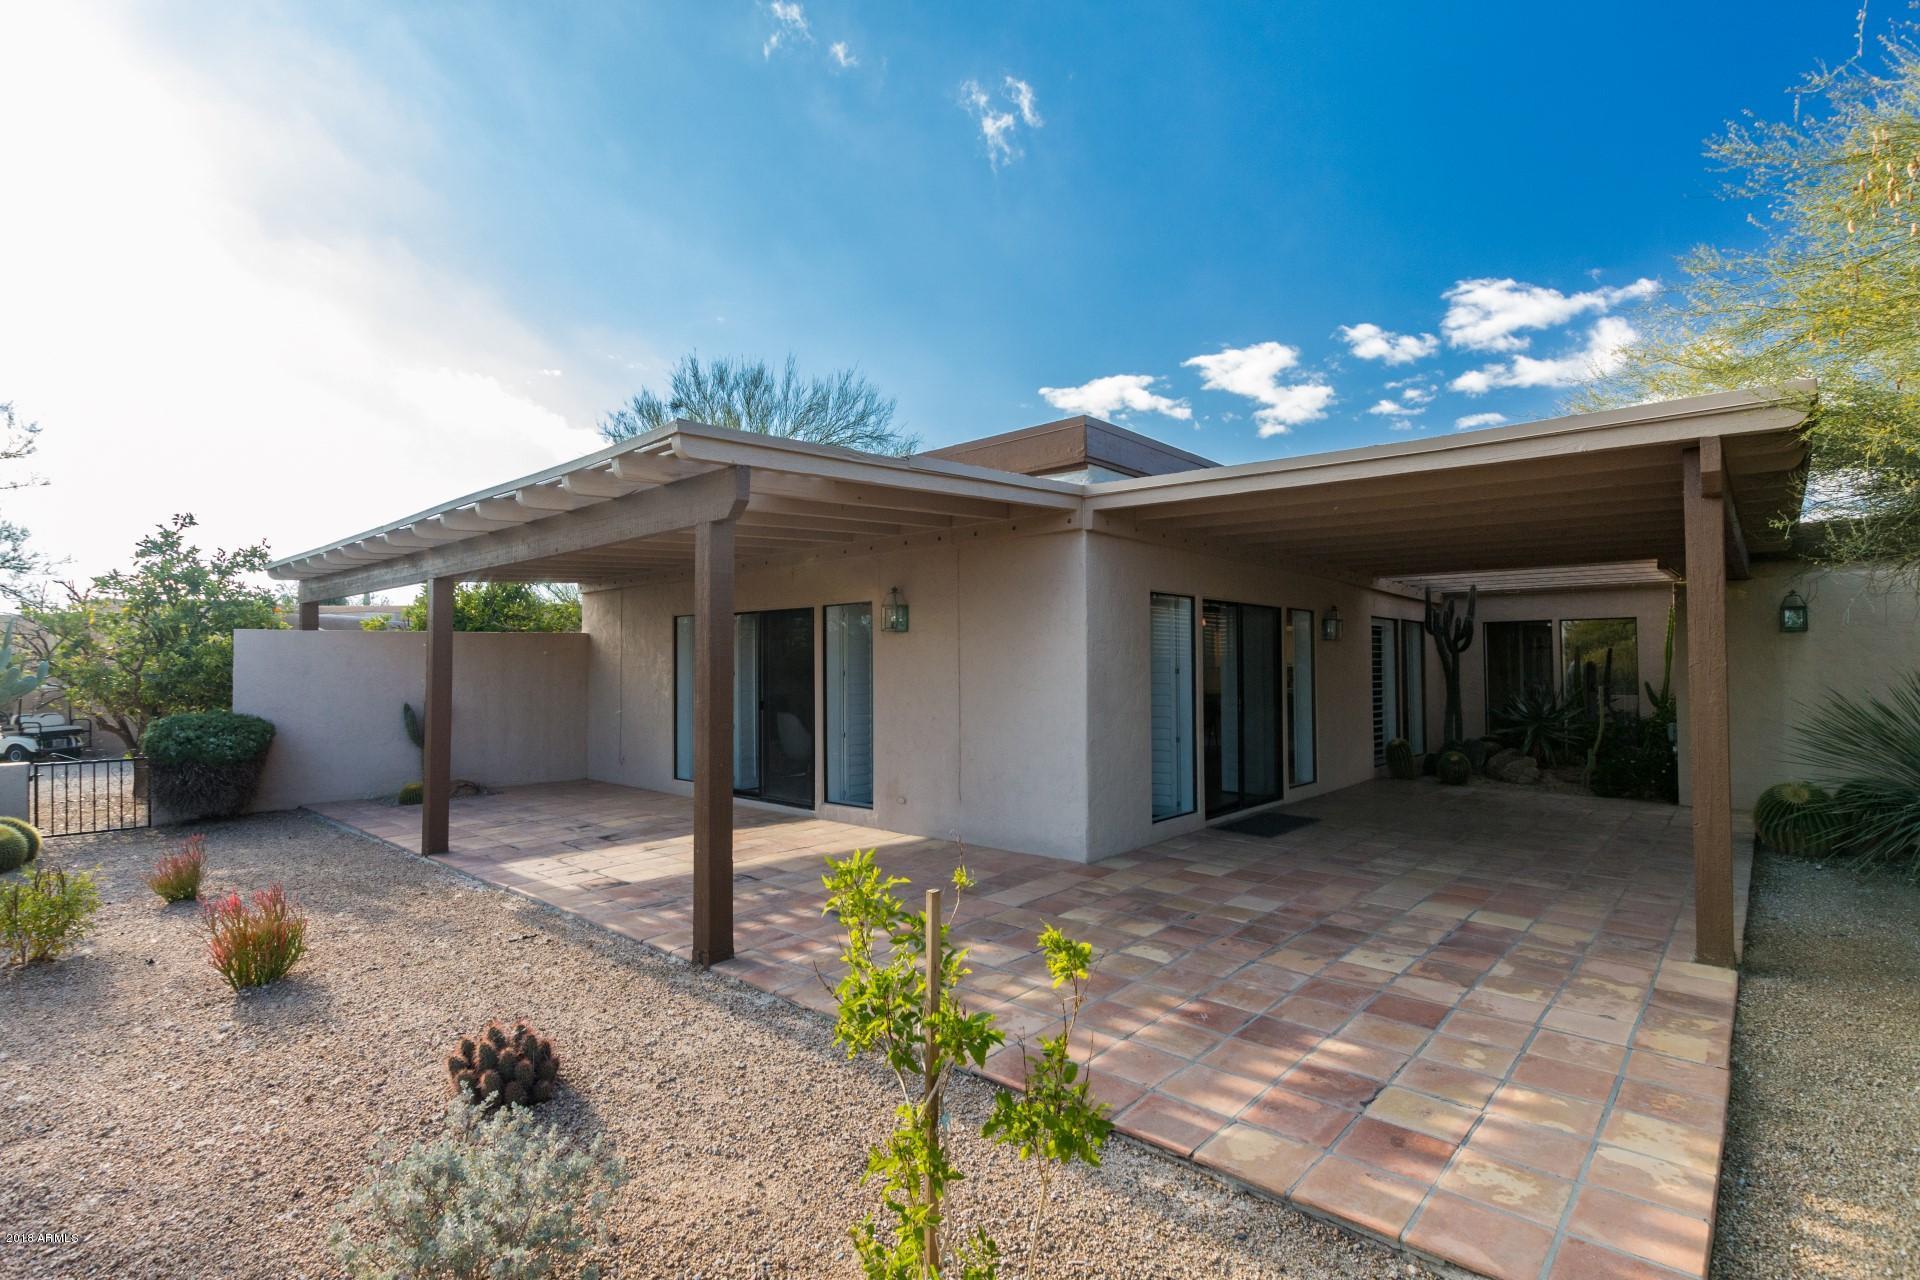 MLS 5860747 1054 BOULDER Drive, Carefree, AZ 85377 Carefree AZ Community Pool